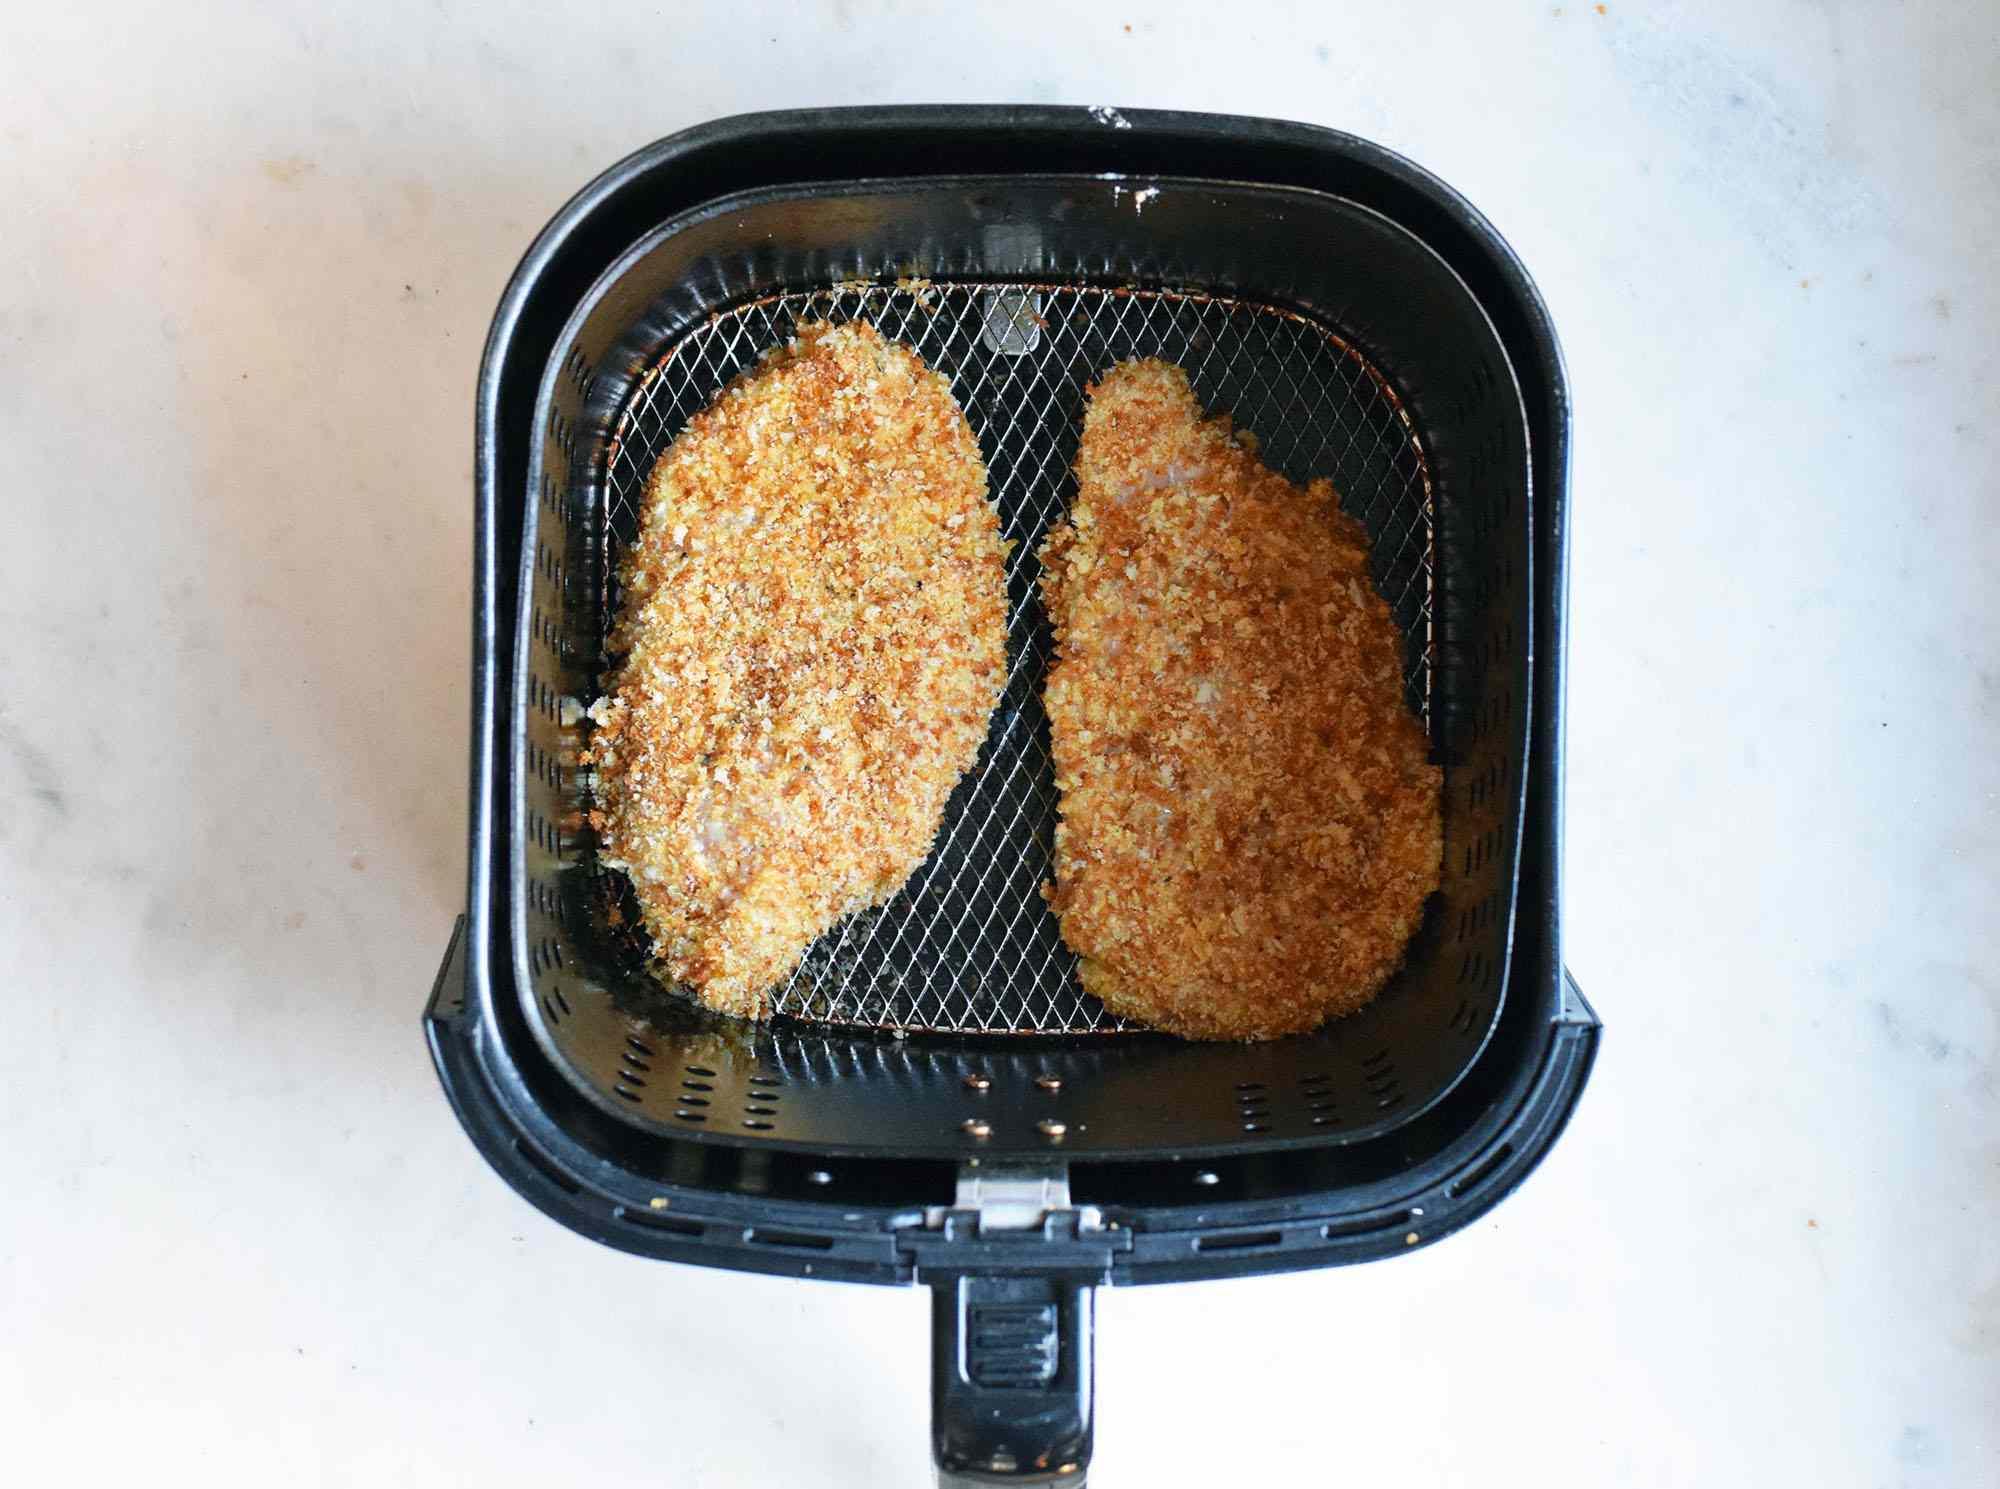 battered chicken in an air fryer basket